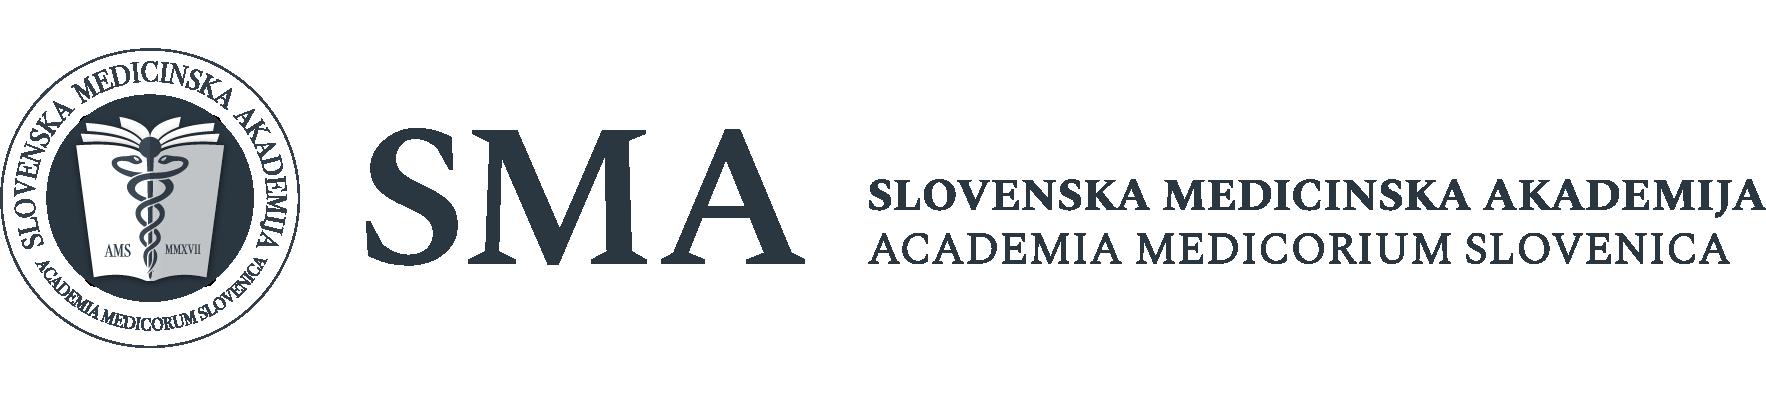 Slovenska medicinska akademija